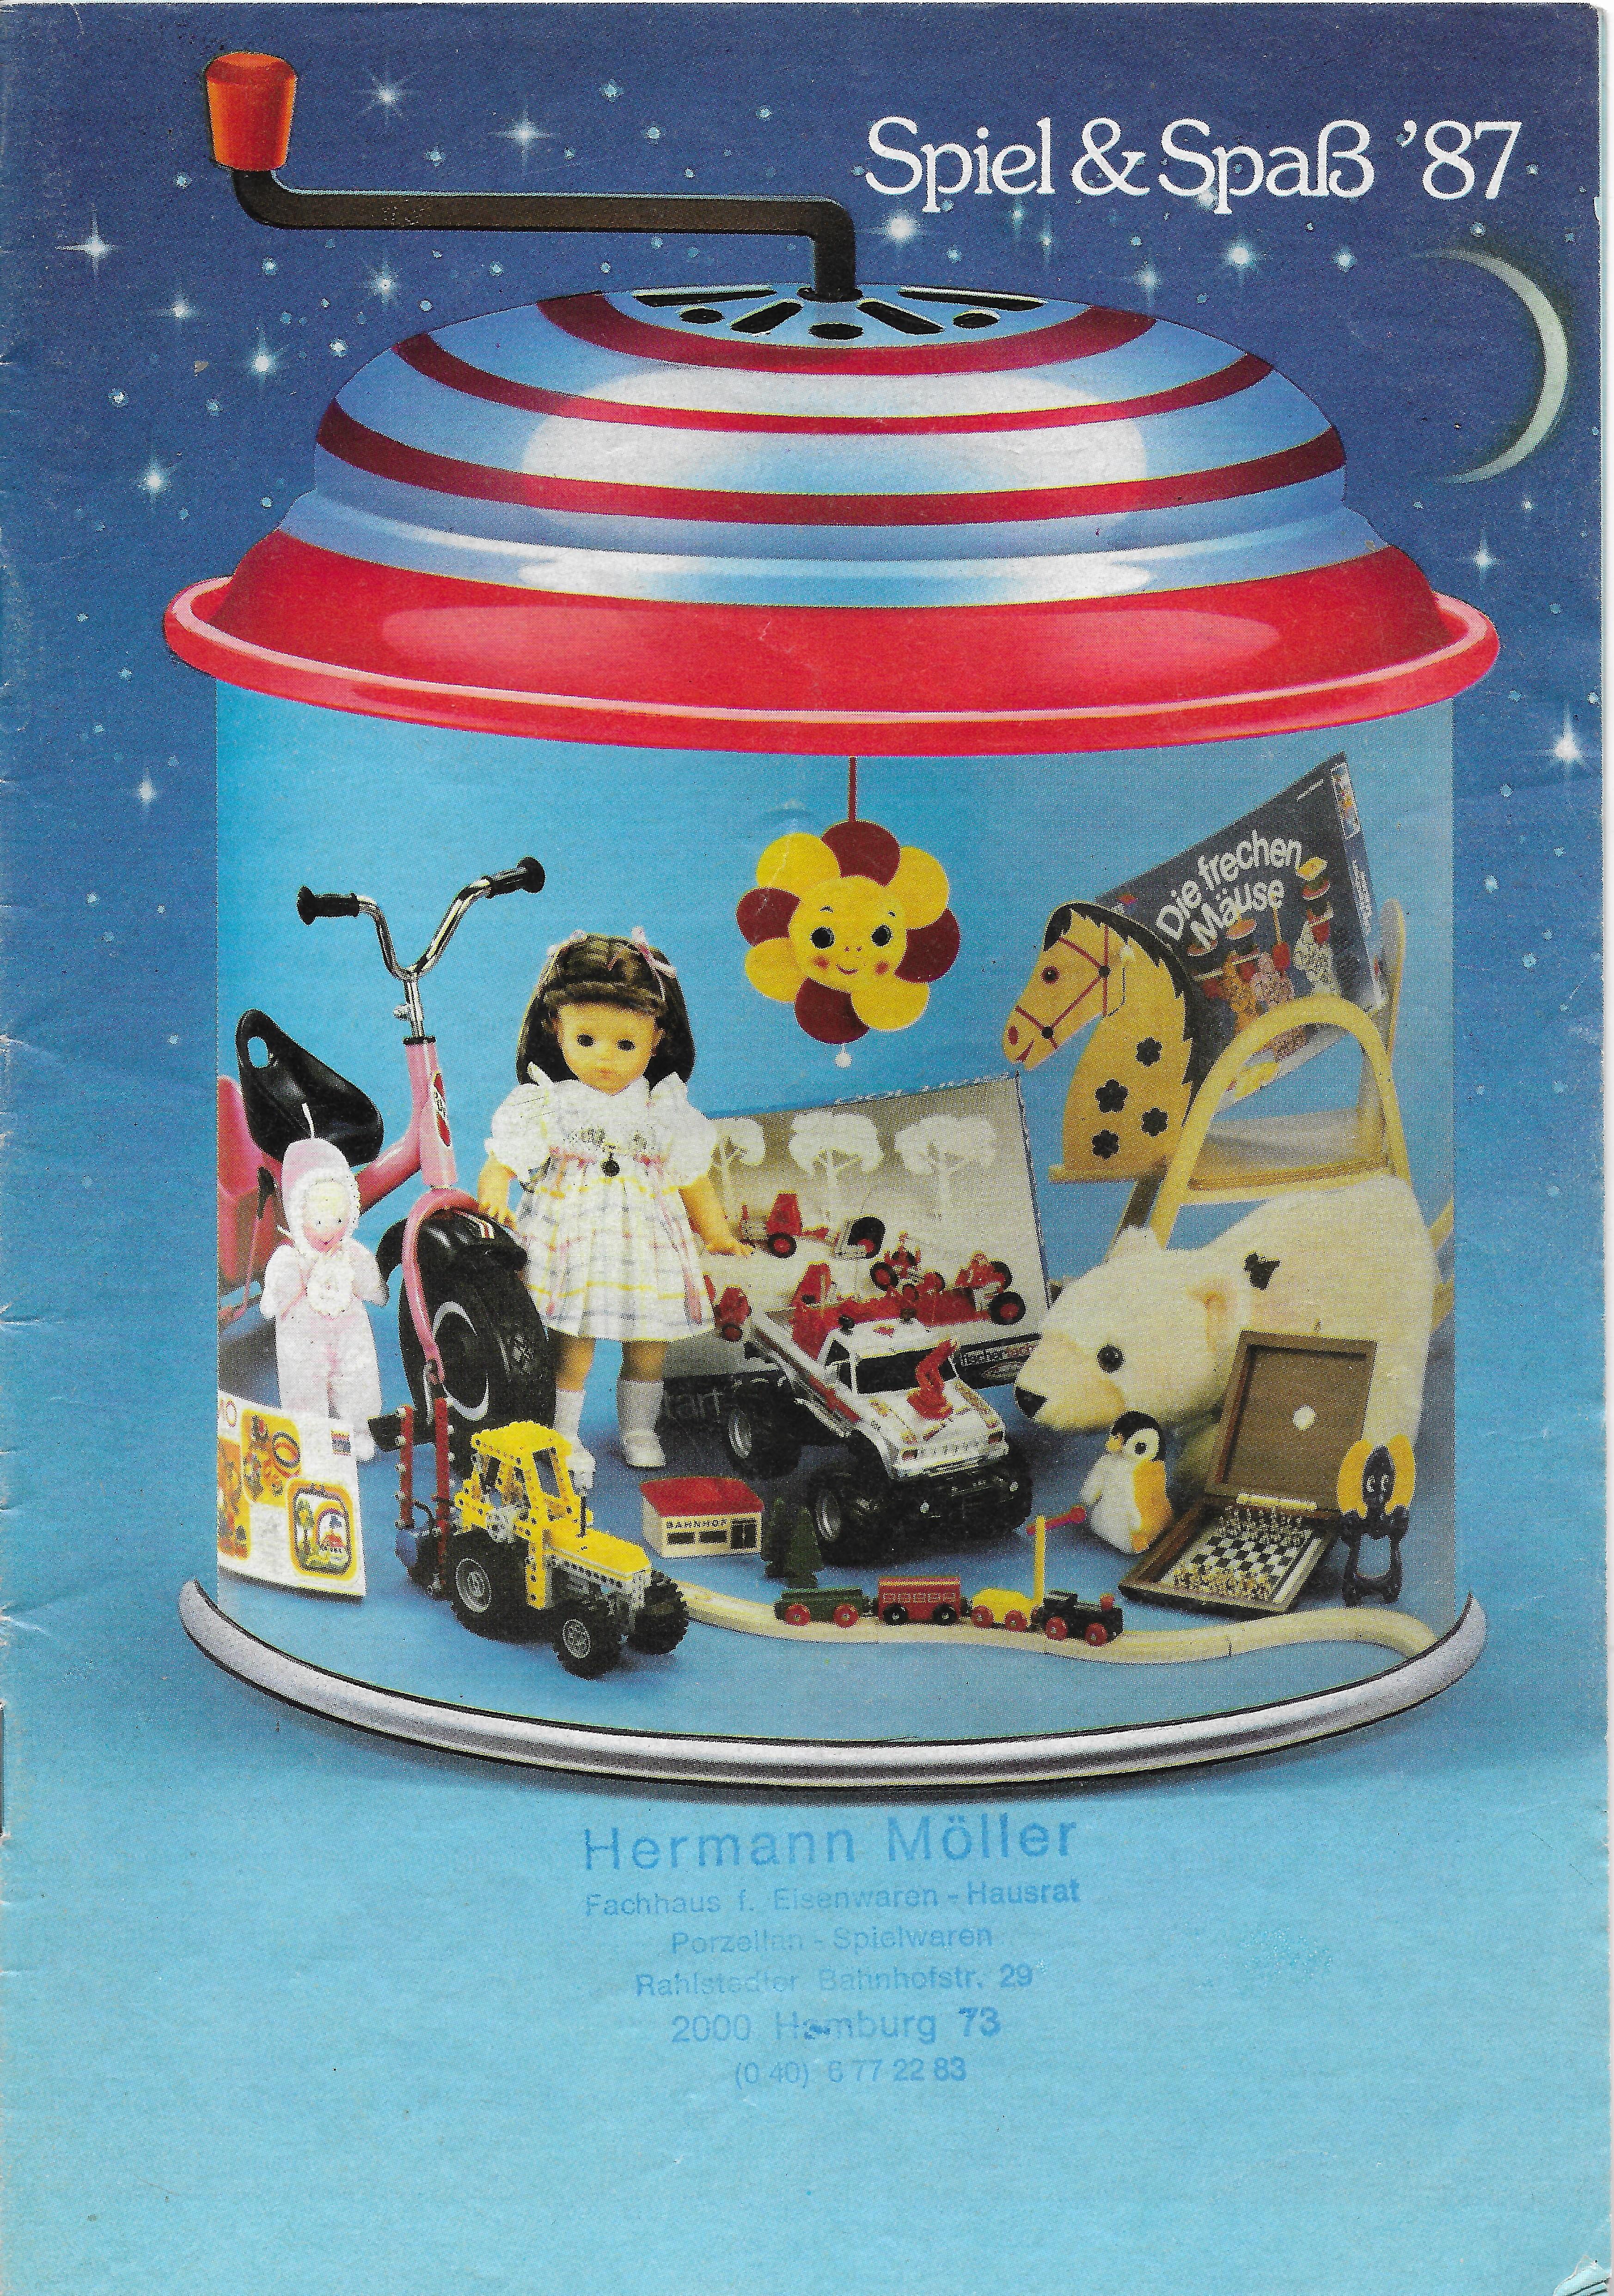 Advent I. - 1987-es Spiel & Spaß katalógus Németországból